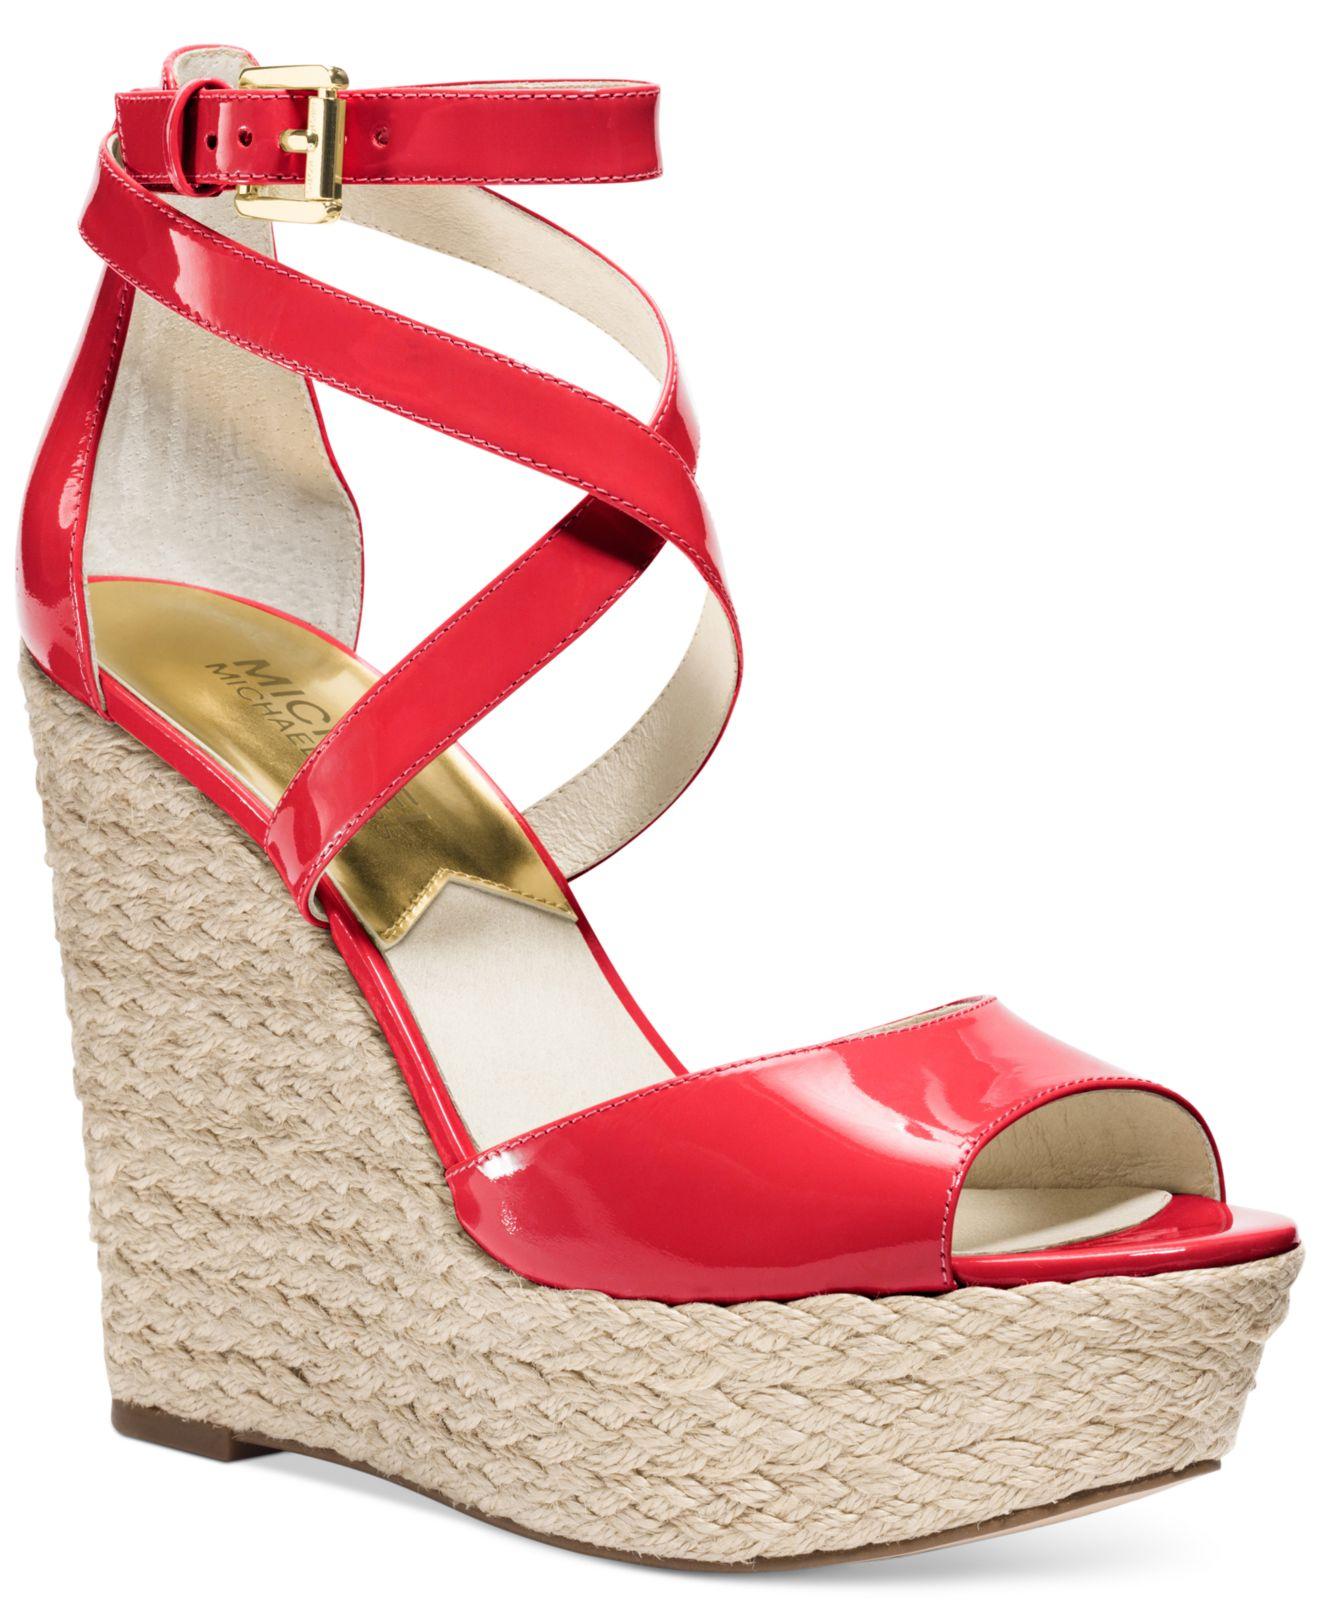 aa75558a9cc4 Lyst - Michael Kors Michael Gabriella Platform Wedge Sandals in Red